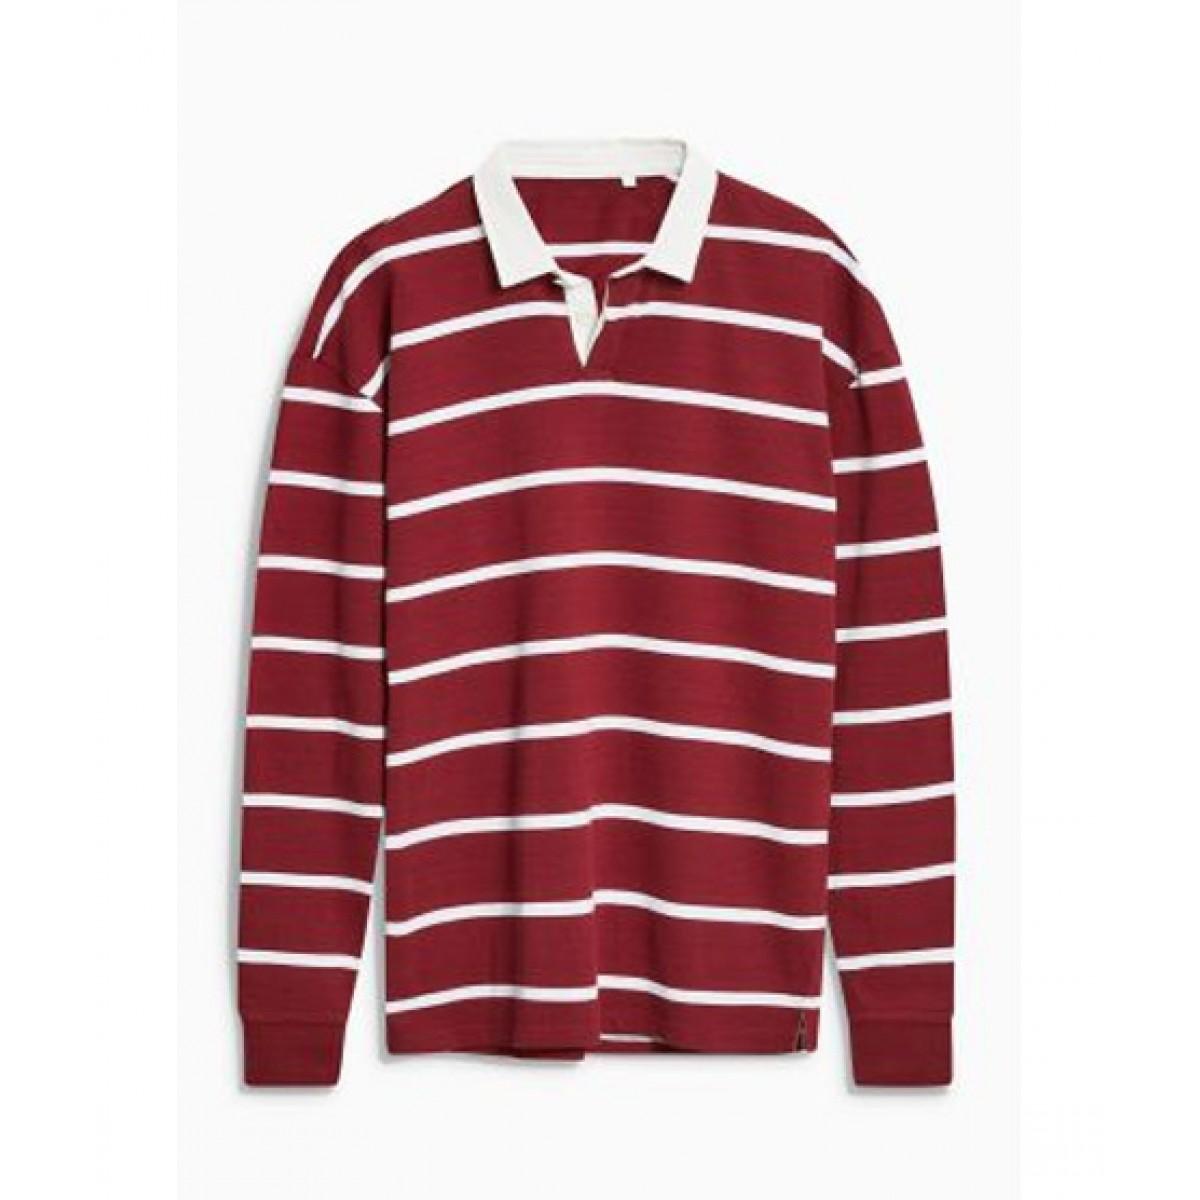 77843aacf04e Next Stripe Rugby Men s Polo T-Shirt Price in Pakistan